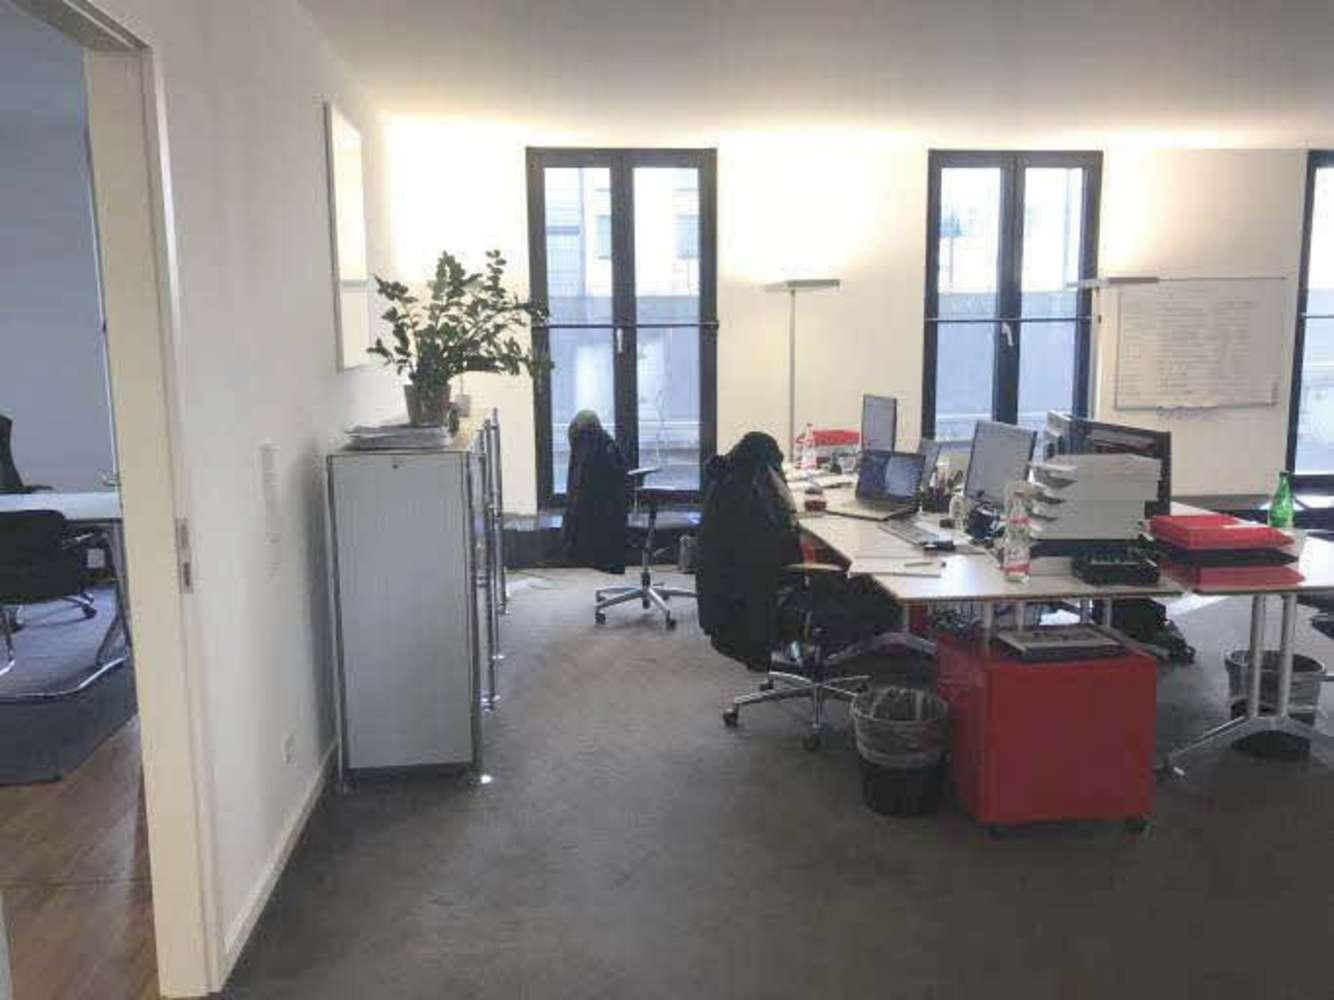 Büros Frankfurt am main, 60329 - Büro - Frankfurt am Main, Bahnhofsviertel - F0050 - 10482693